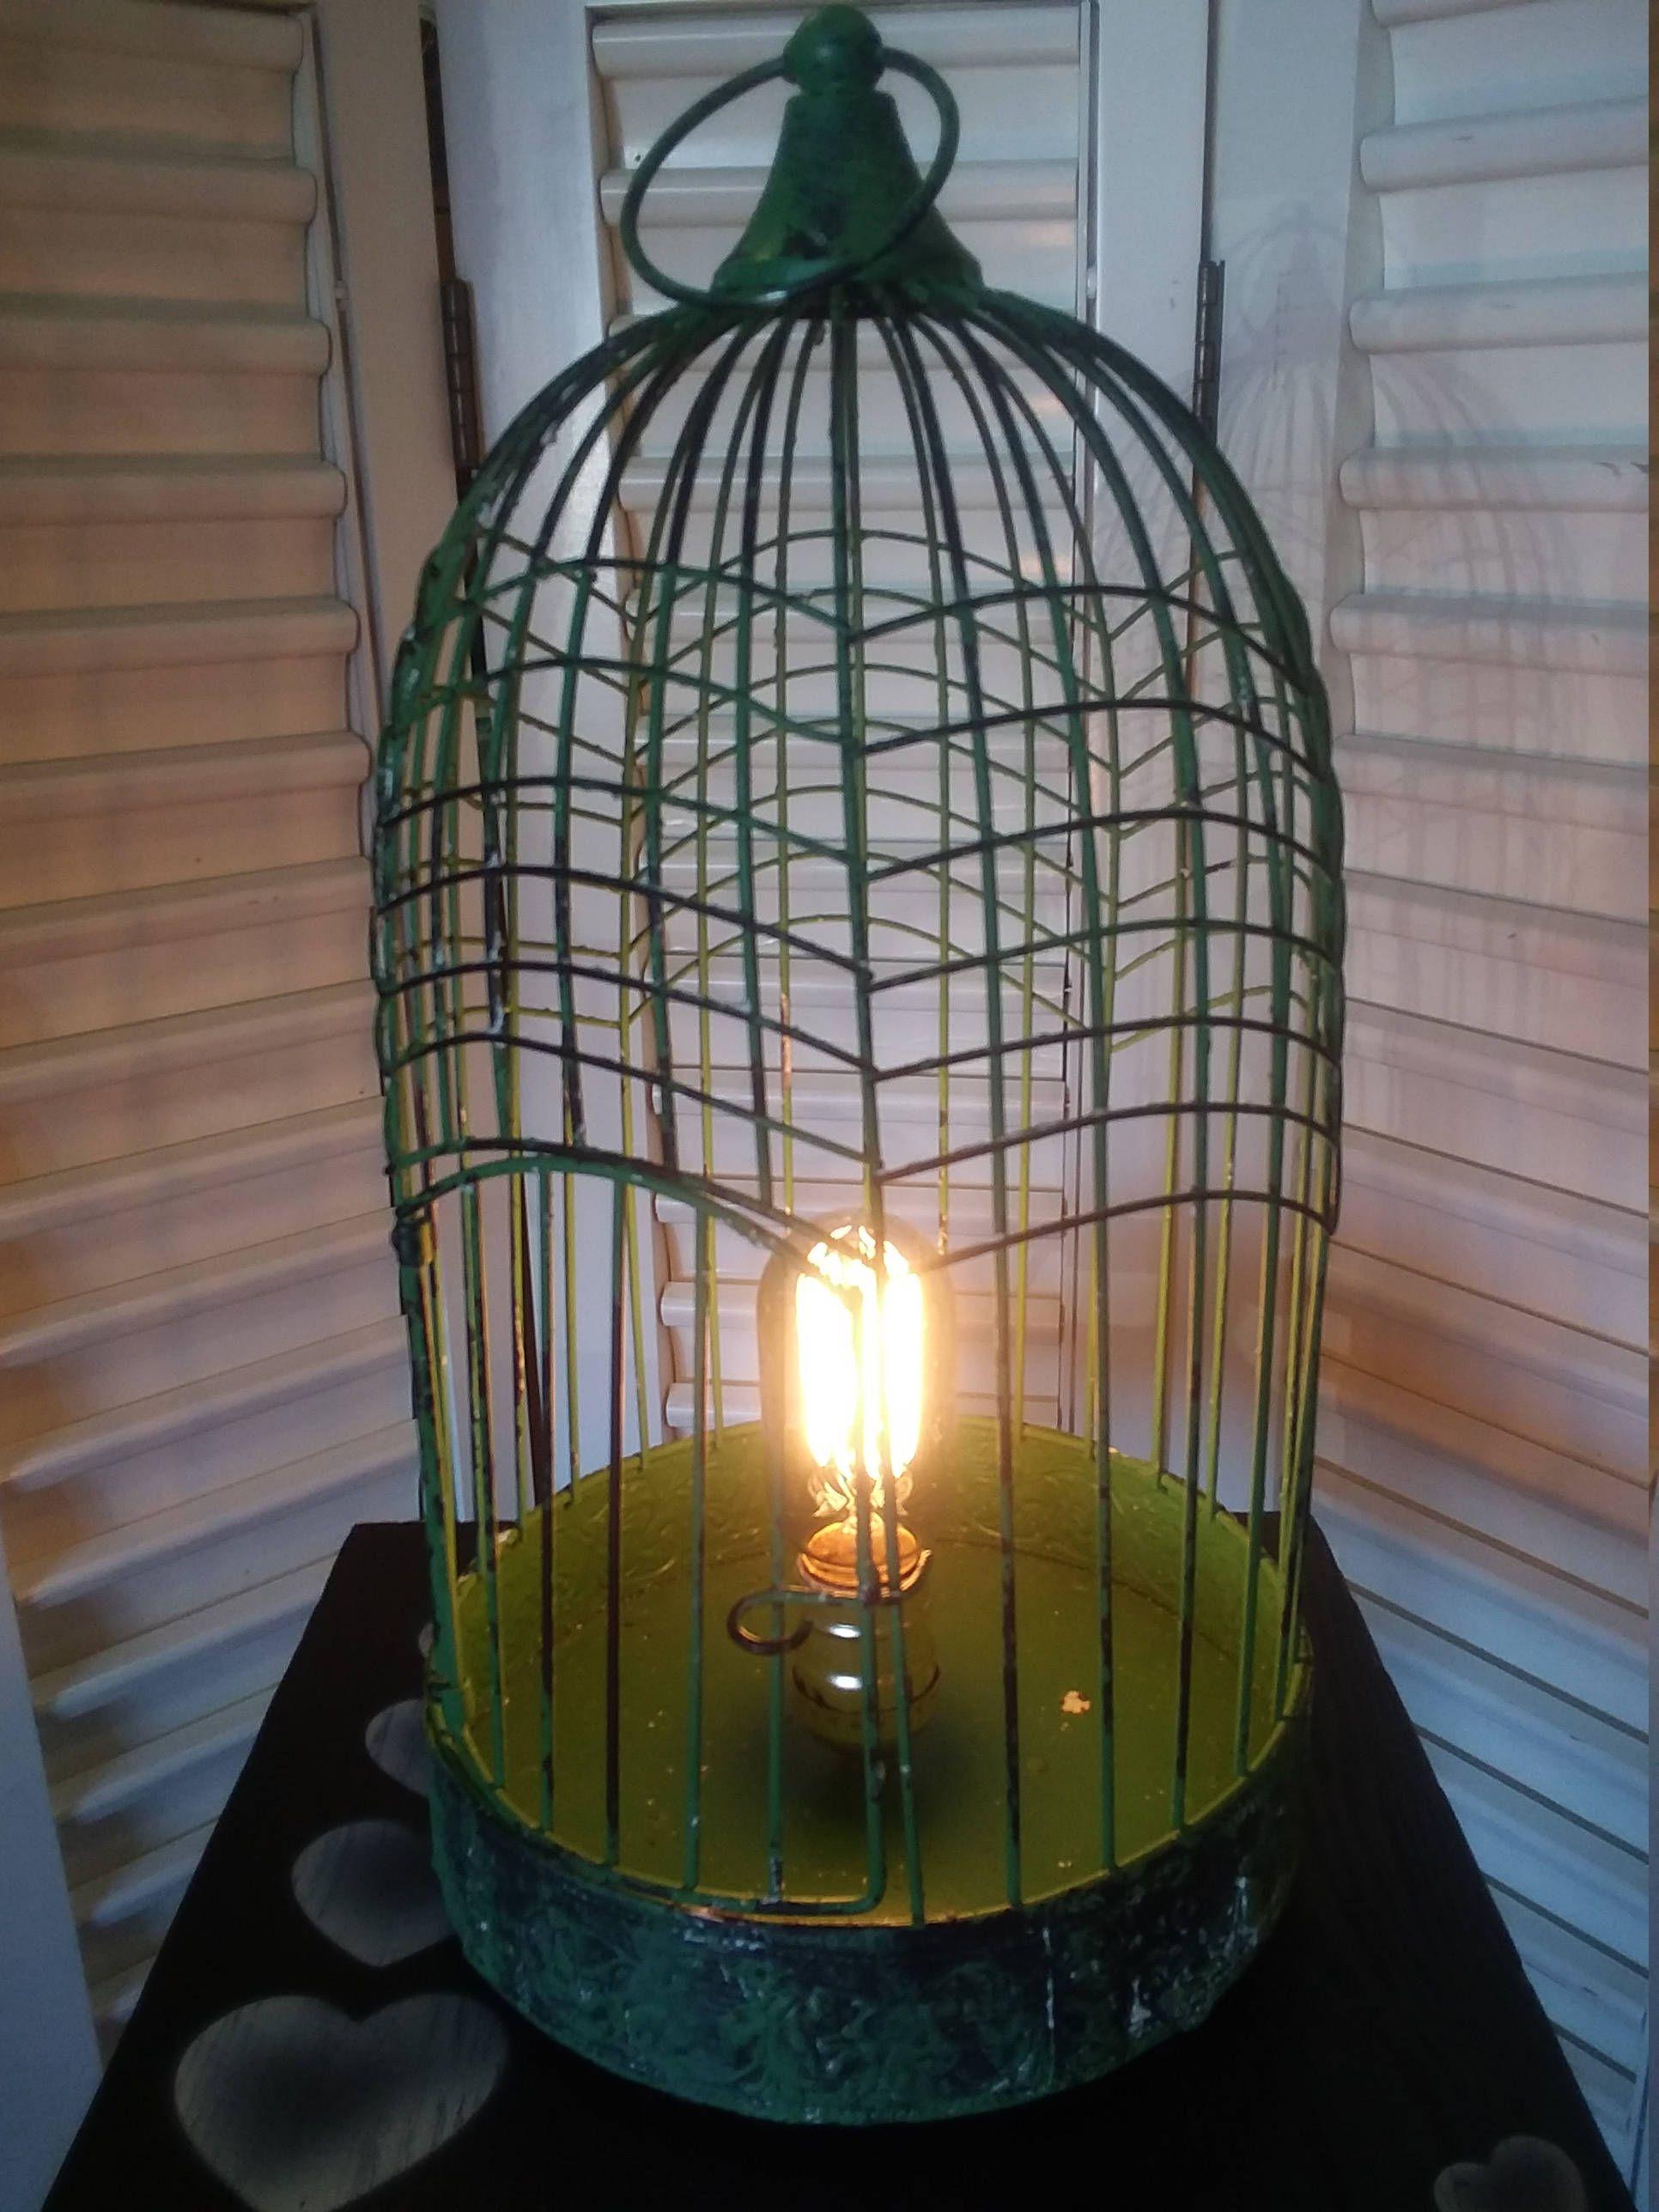 Metal Birdcage Table Top Light. Desk Lamp. Fits Many Decor